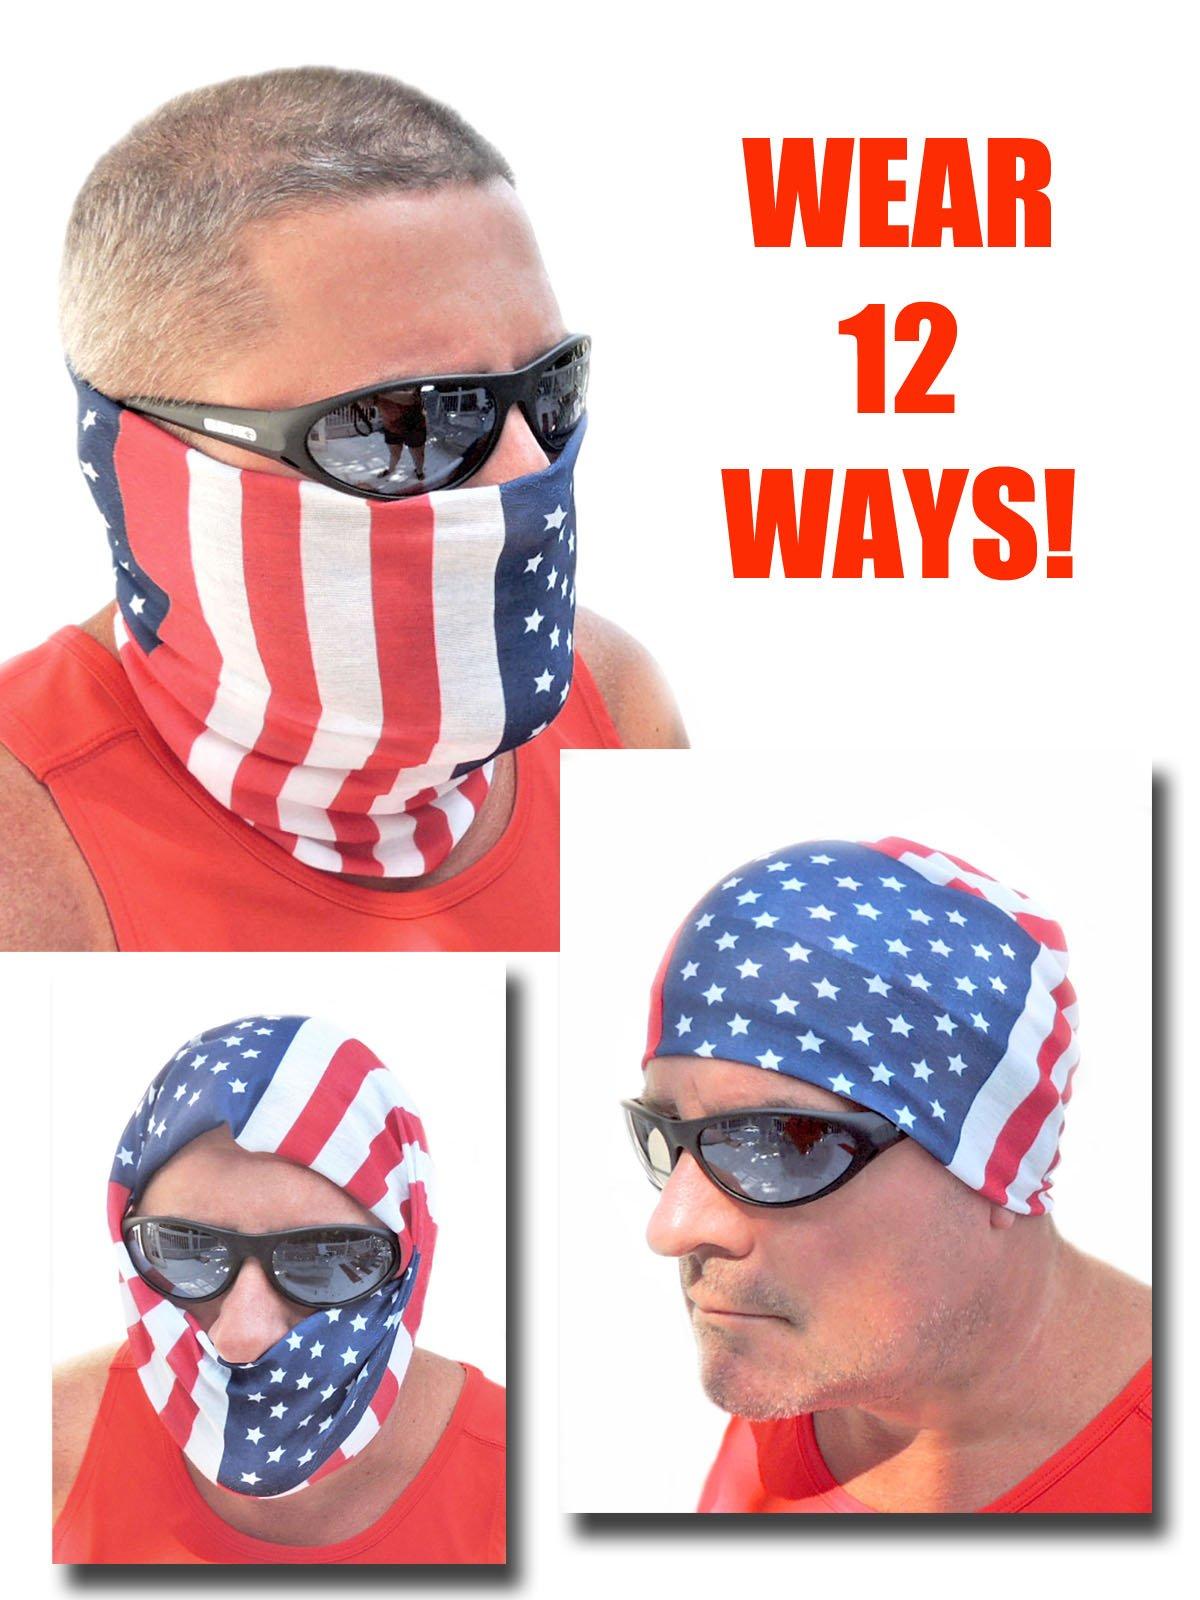 12-in-1 Headband - USA American Flag Versatile Sports & Casual Headwear - Wear as a Bandana, Neck Gaiter, Balaclava, Helmet Liner, Mask - High Performance Microfiber